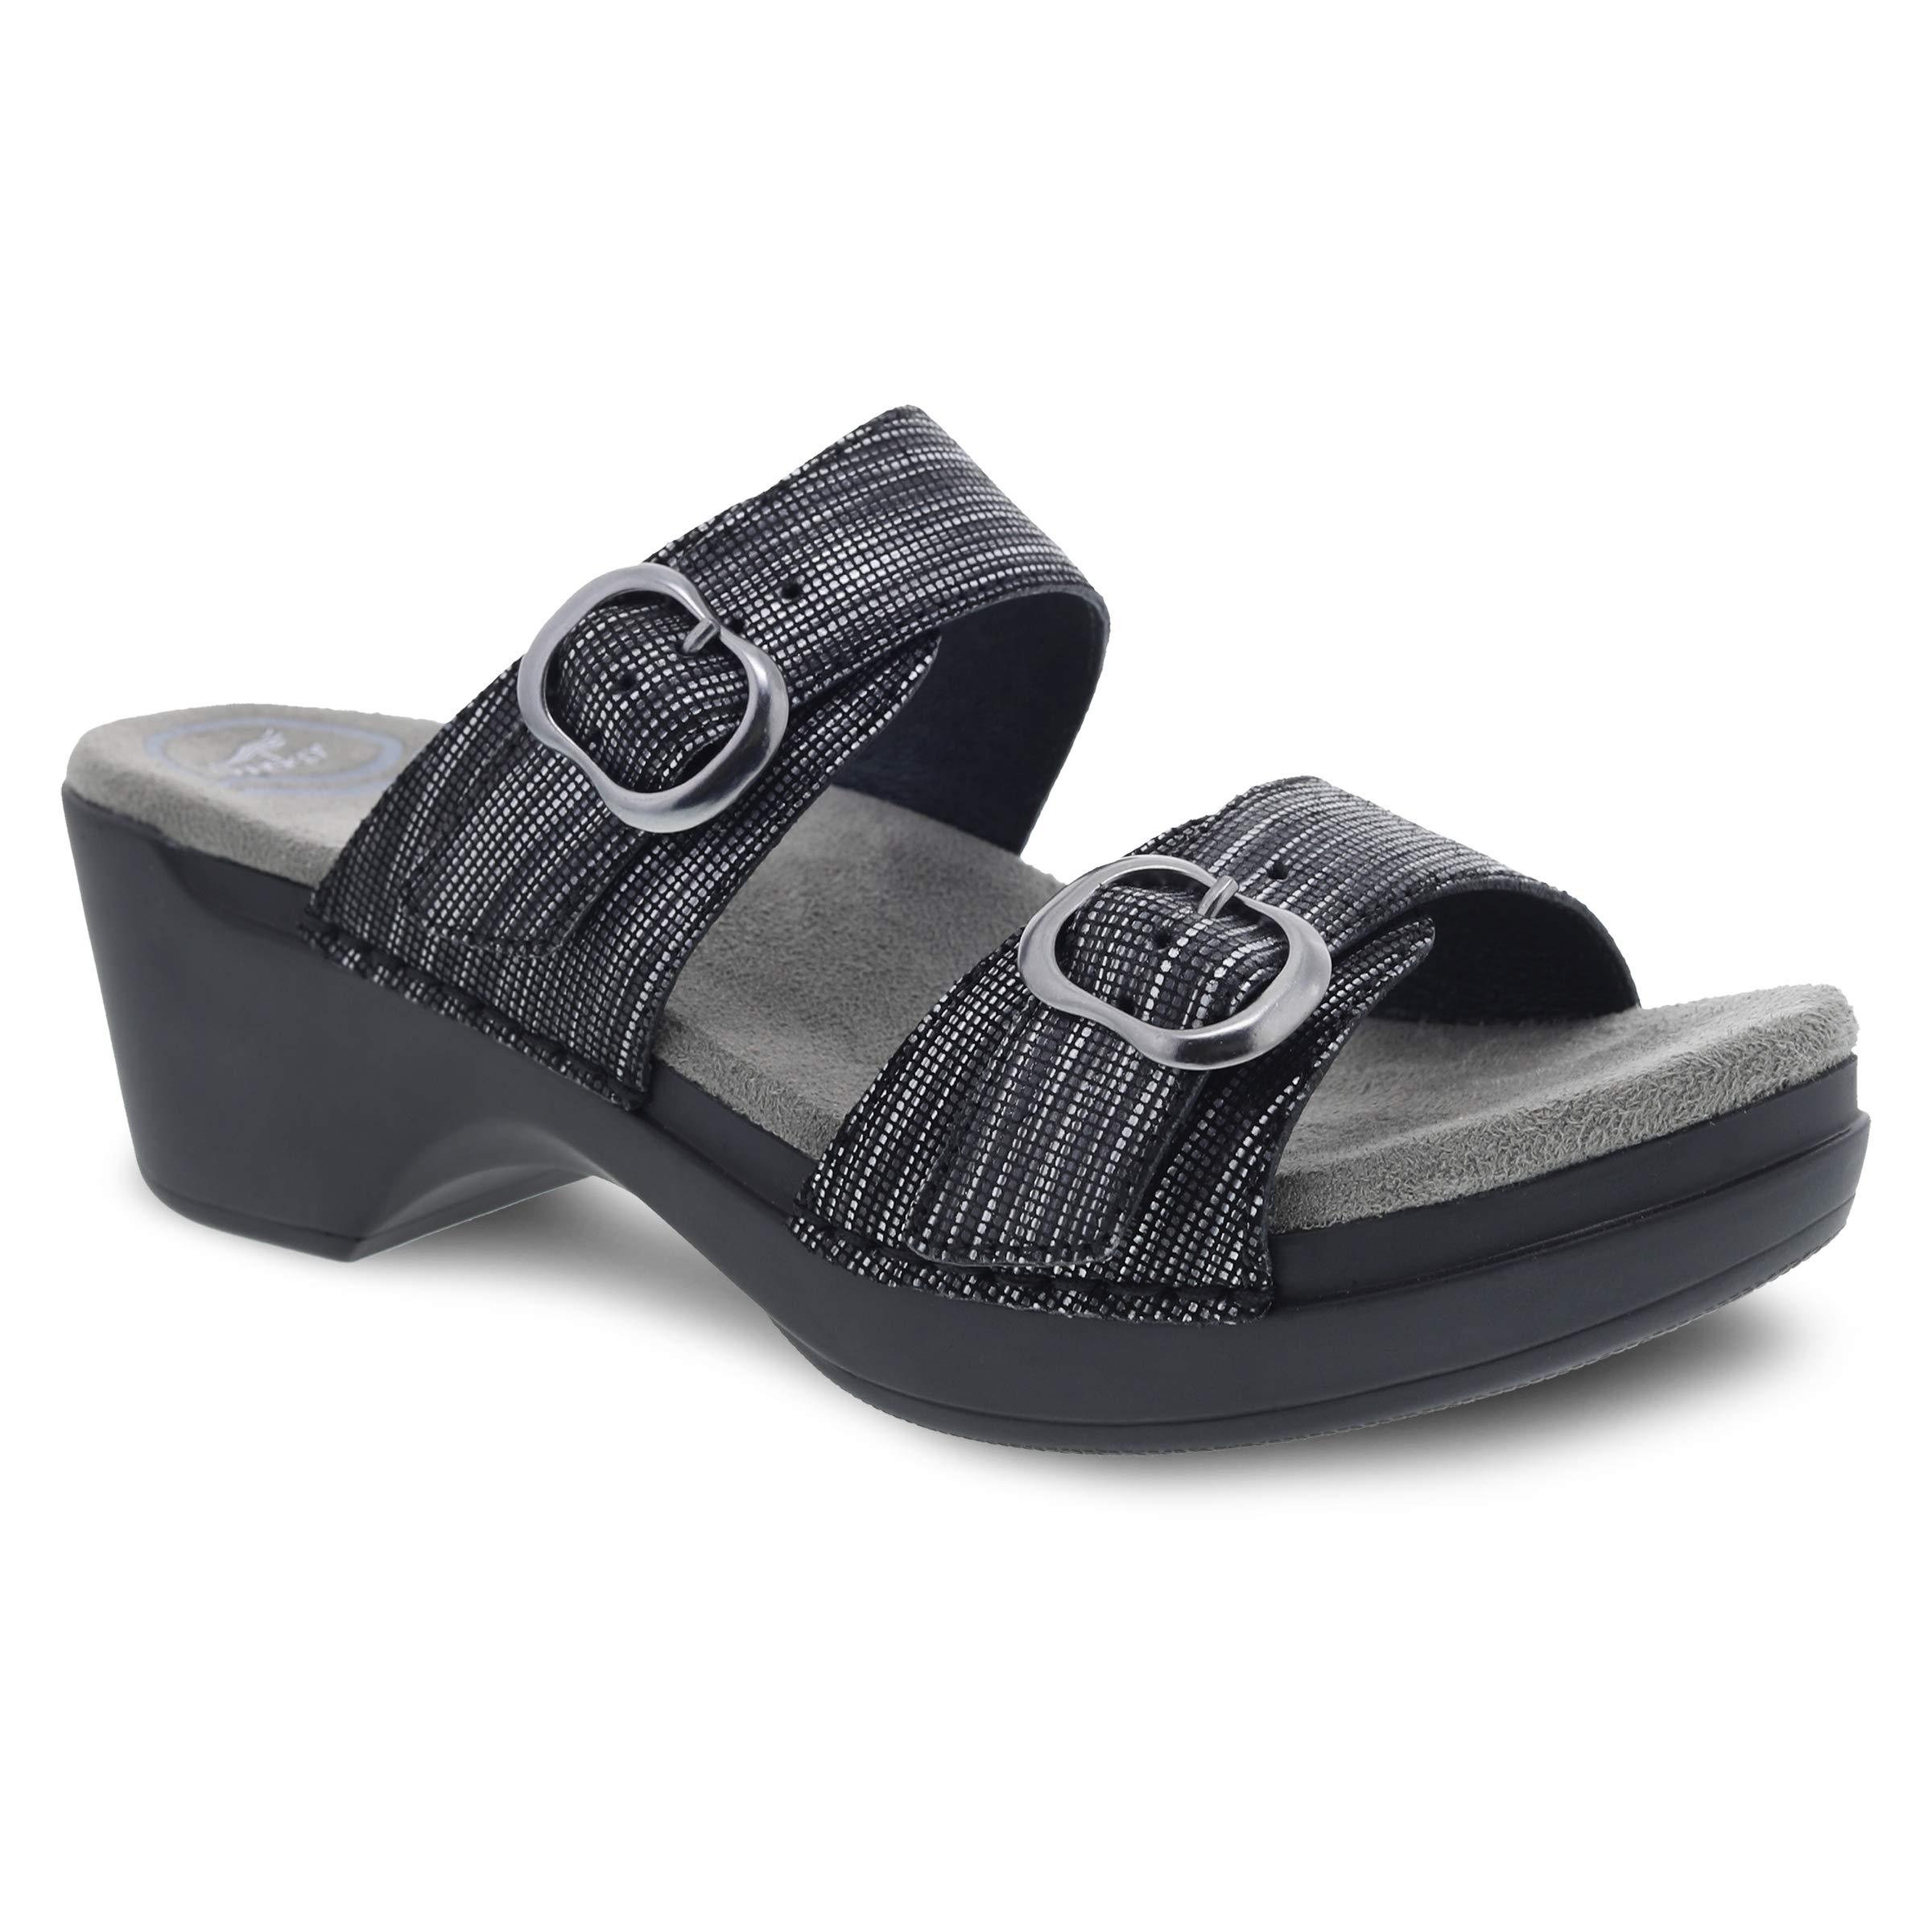 Dansko Women's Sophie Black Metallic Sandal 7.5-8 M US by Dansko